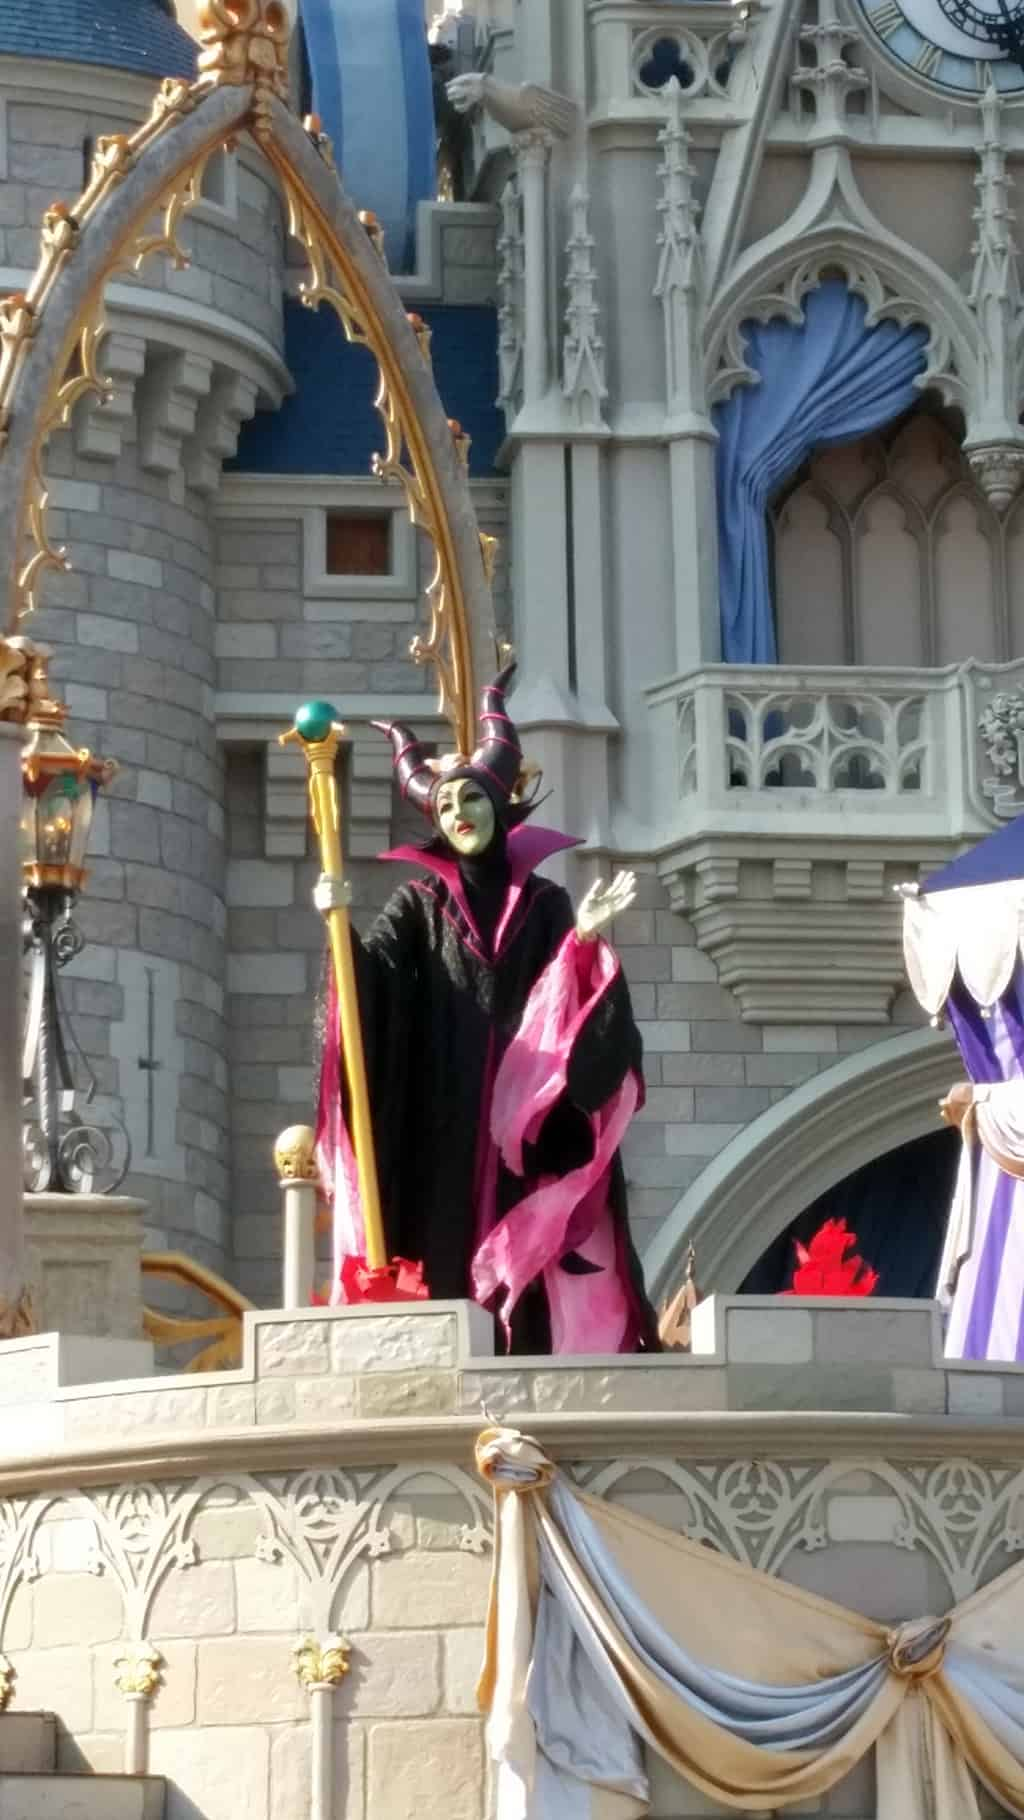 Maleficent in in Magic Kingdom in Walt Disney World